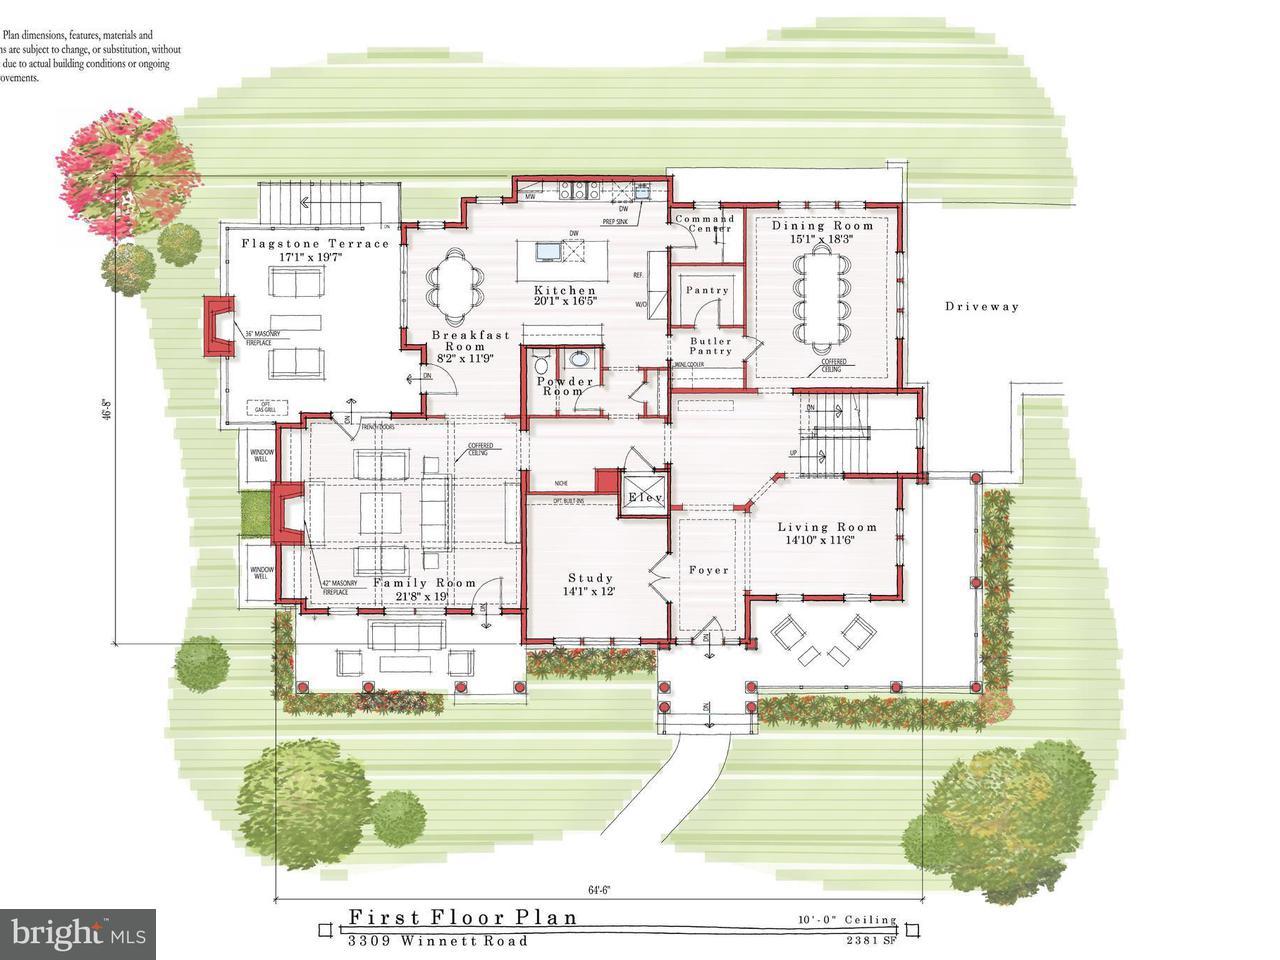 Single Family Home for Sale at 3309 Winnett Road 3309 Winnett Road Chevy Chase, Maryland 20815 United States